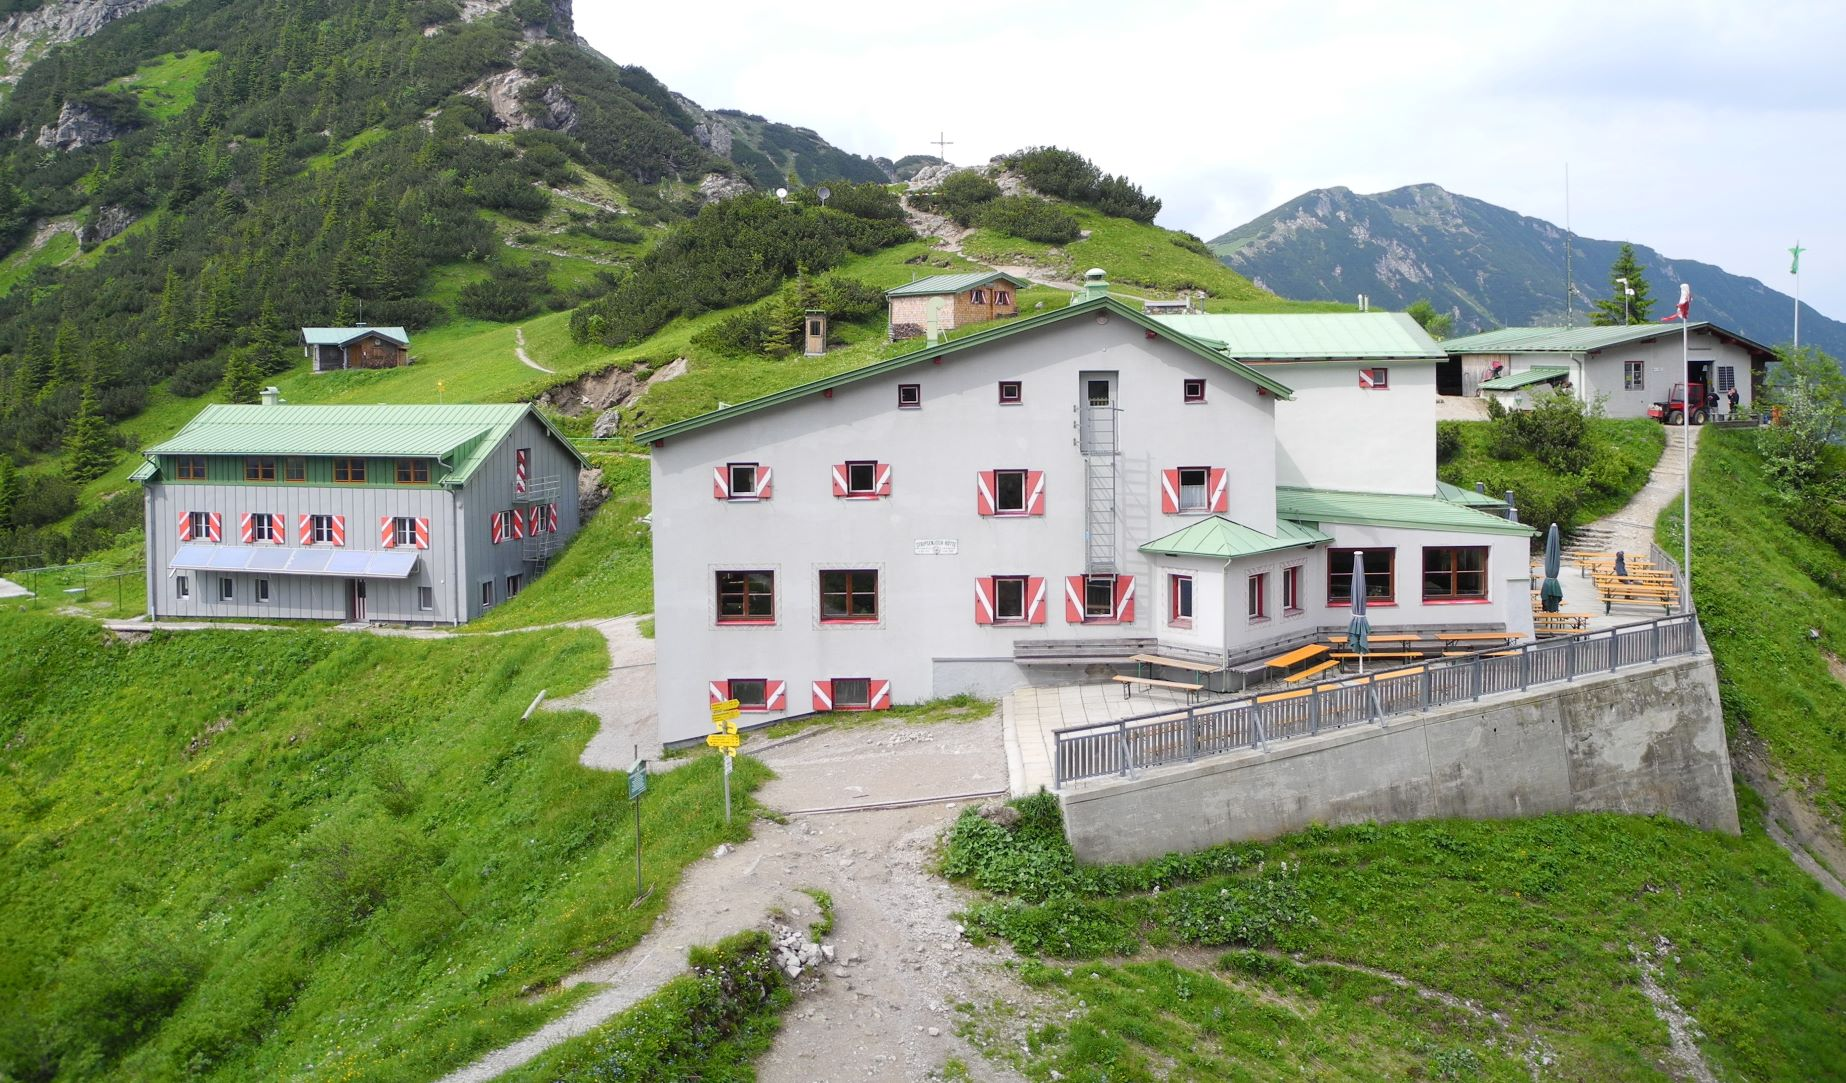 Etappe 36: Erpfendorf – Stripsenjochhaus